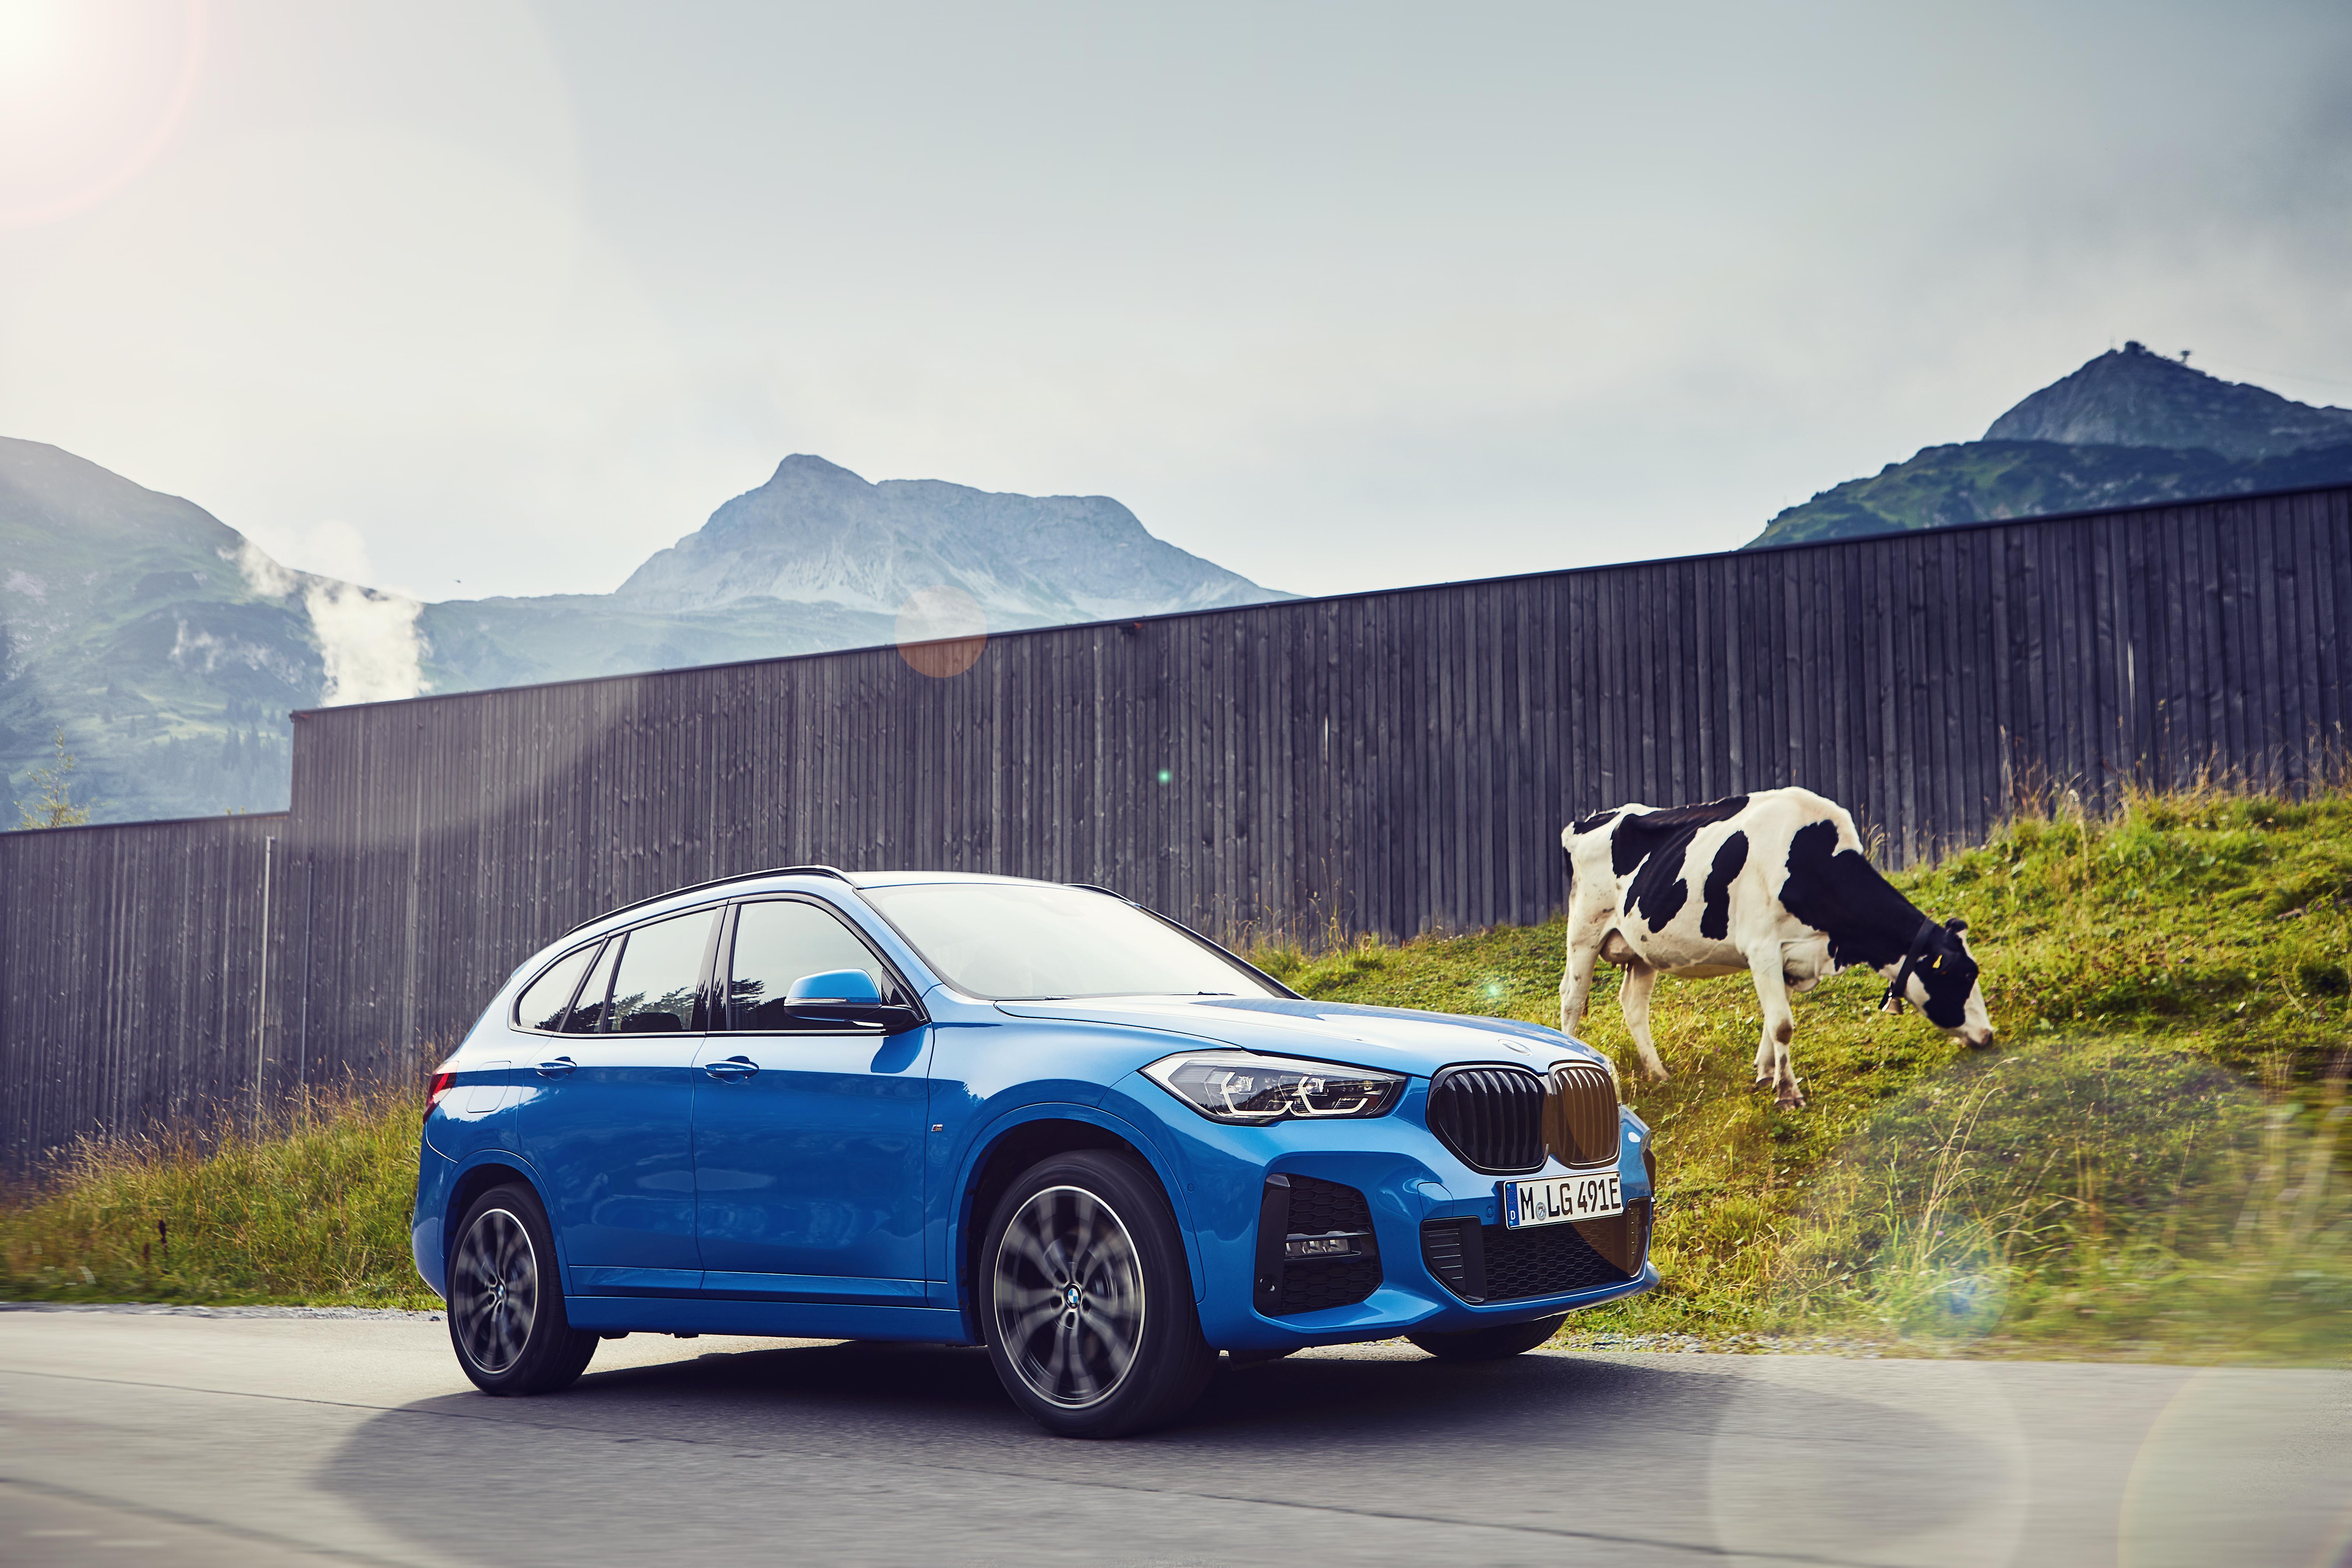 Noul BMW X1 xDrive25e – plug in hybrid in clasa compacta cu autonomie de peste 50 km